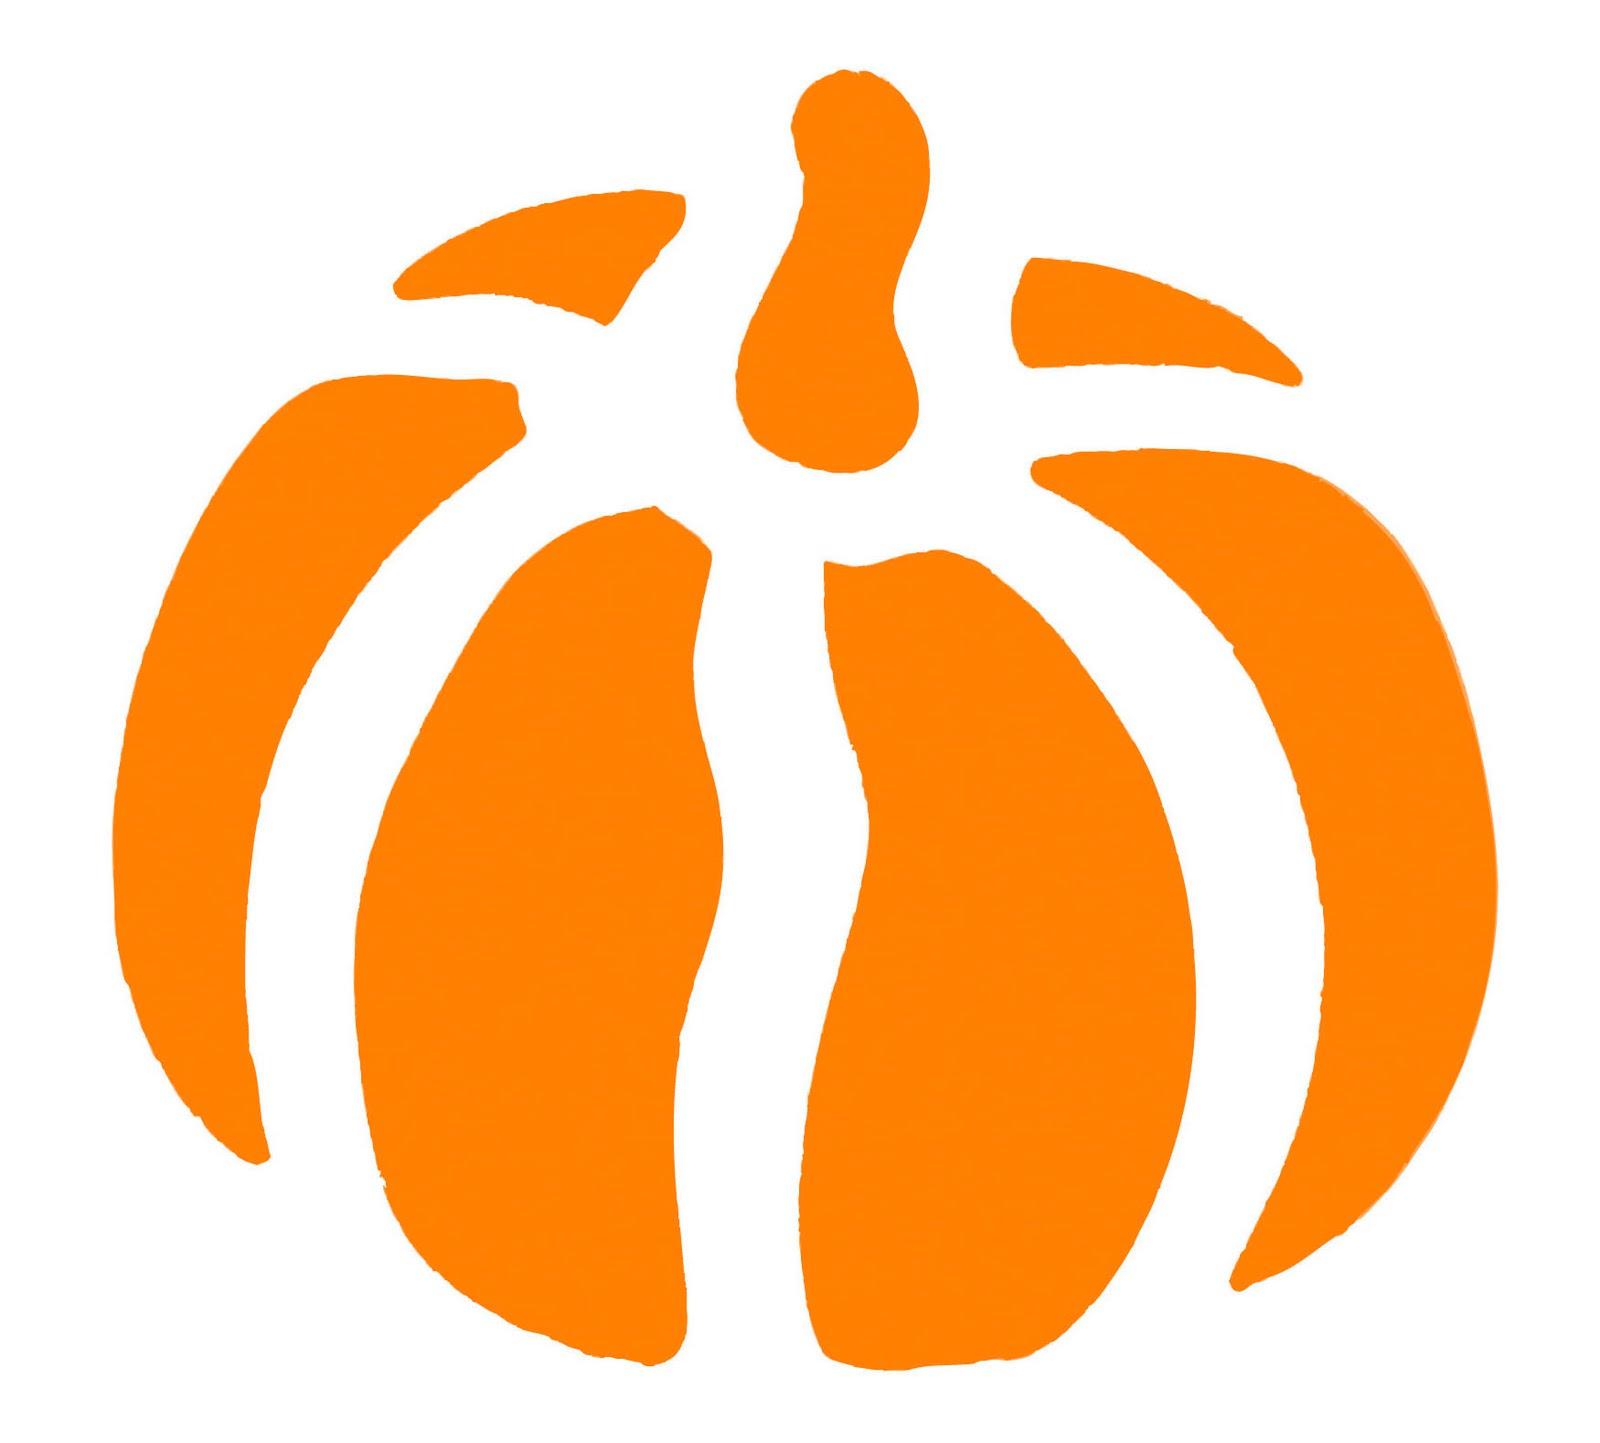 Drawing at getdrawings com. Bb8 clipart pumpkin template